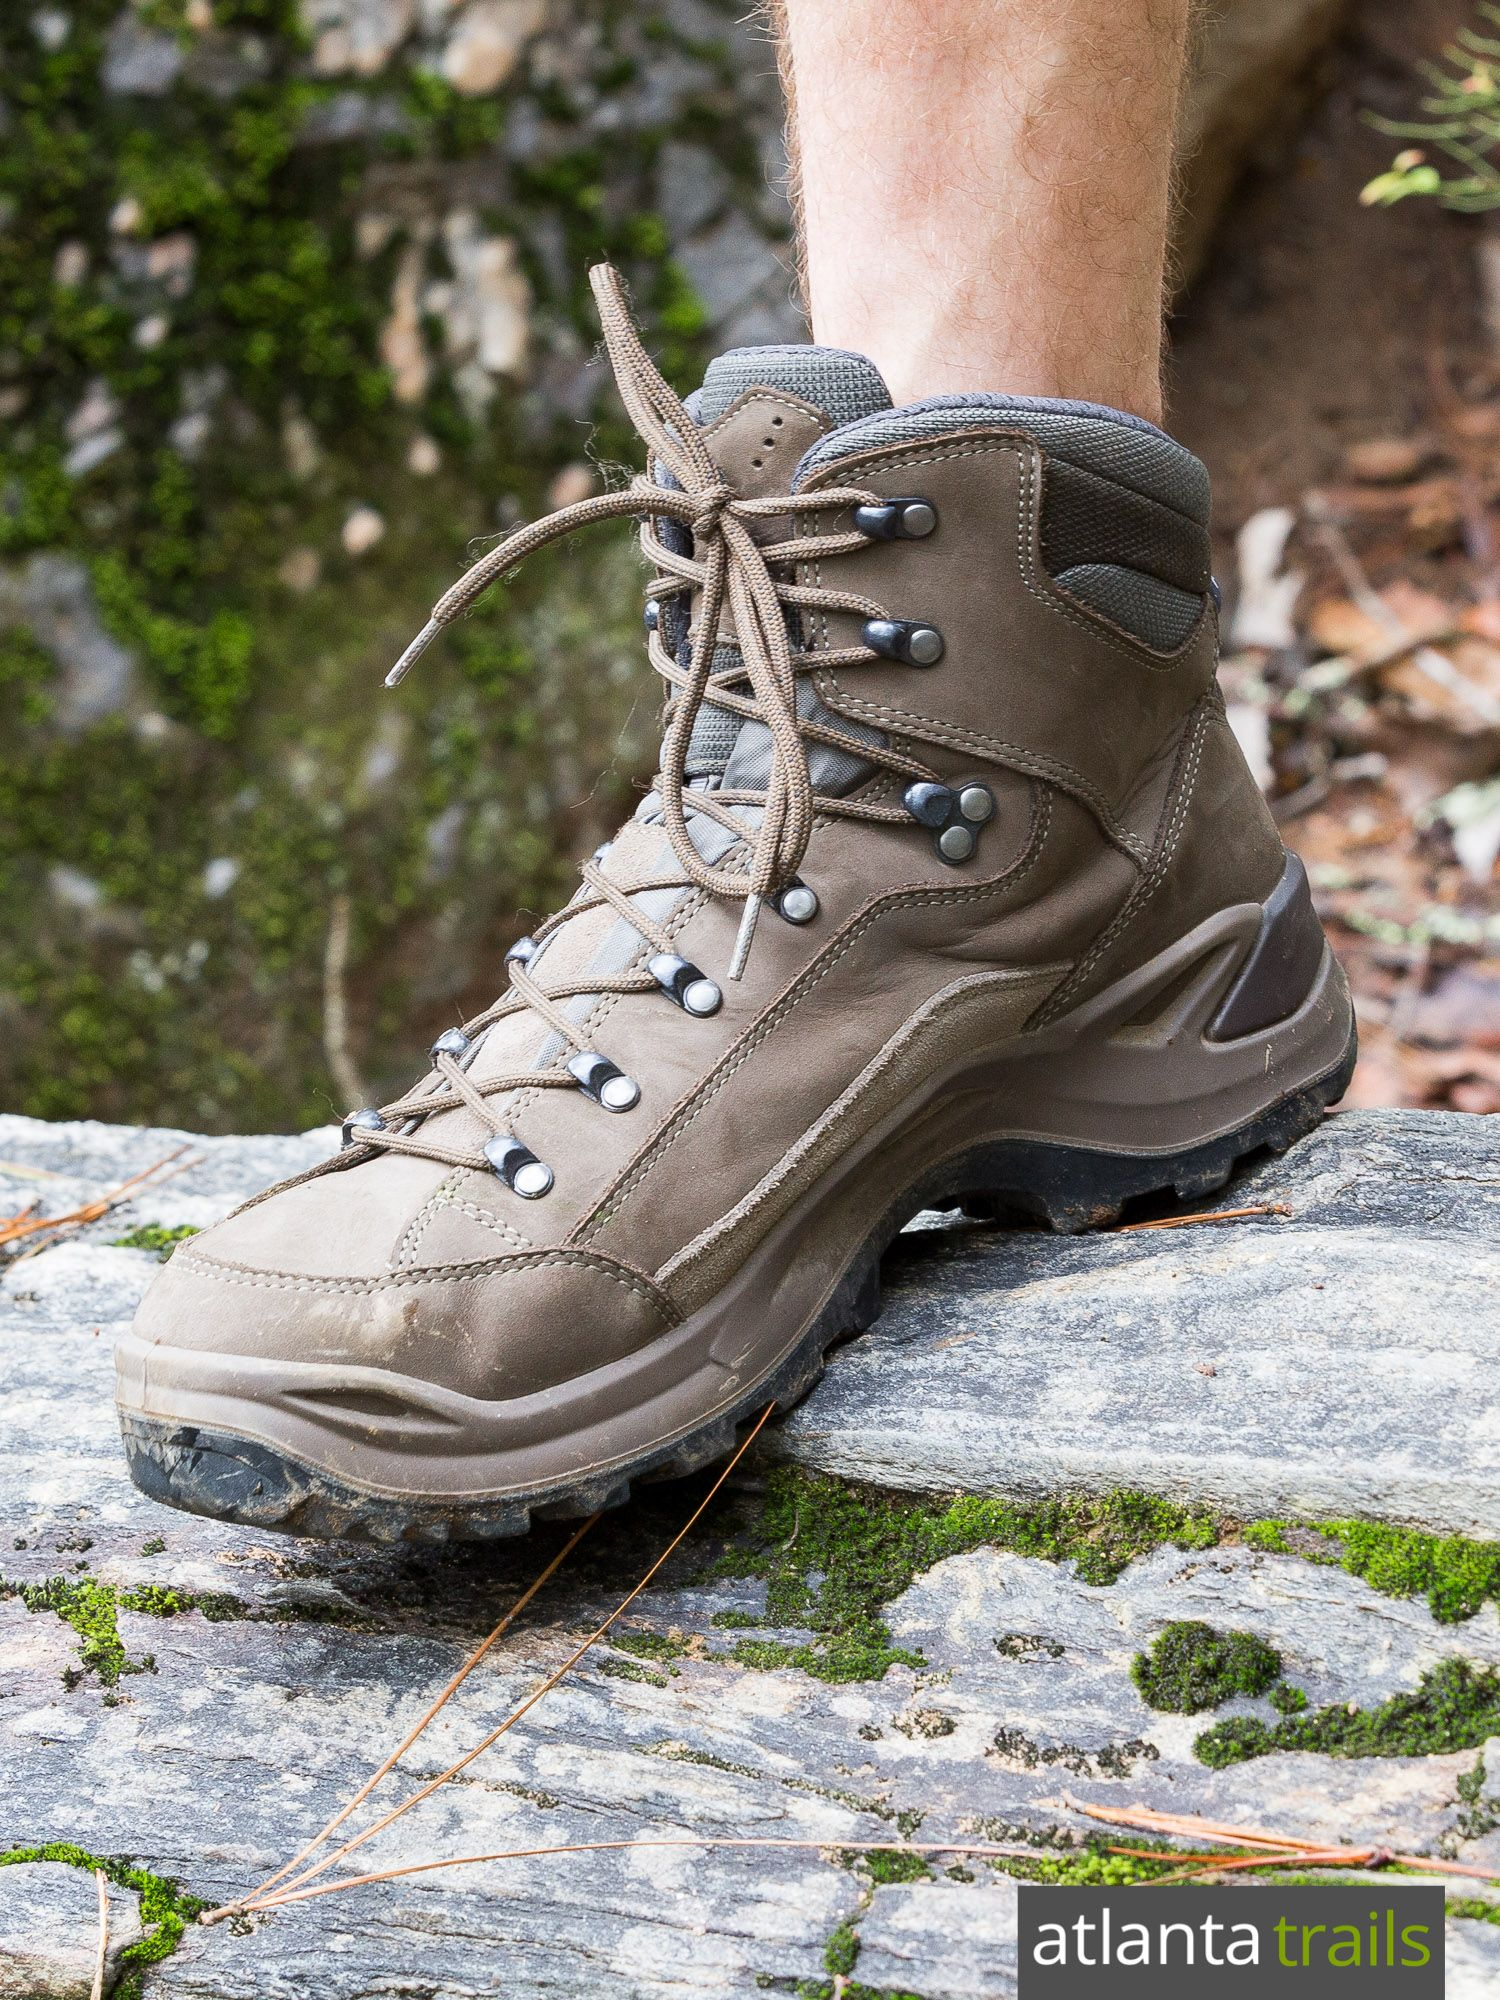 Lowa Renegade Gtx Mid Hiking Boot Review Hiking